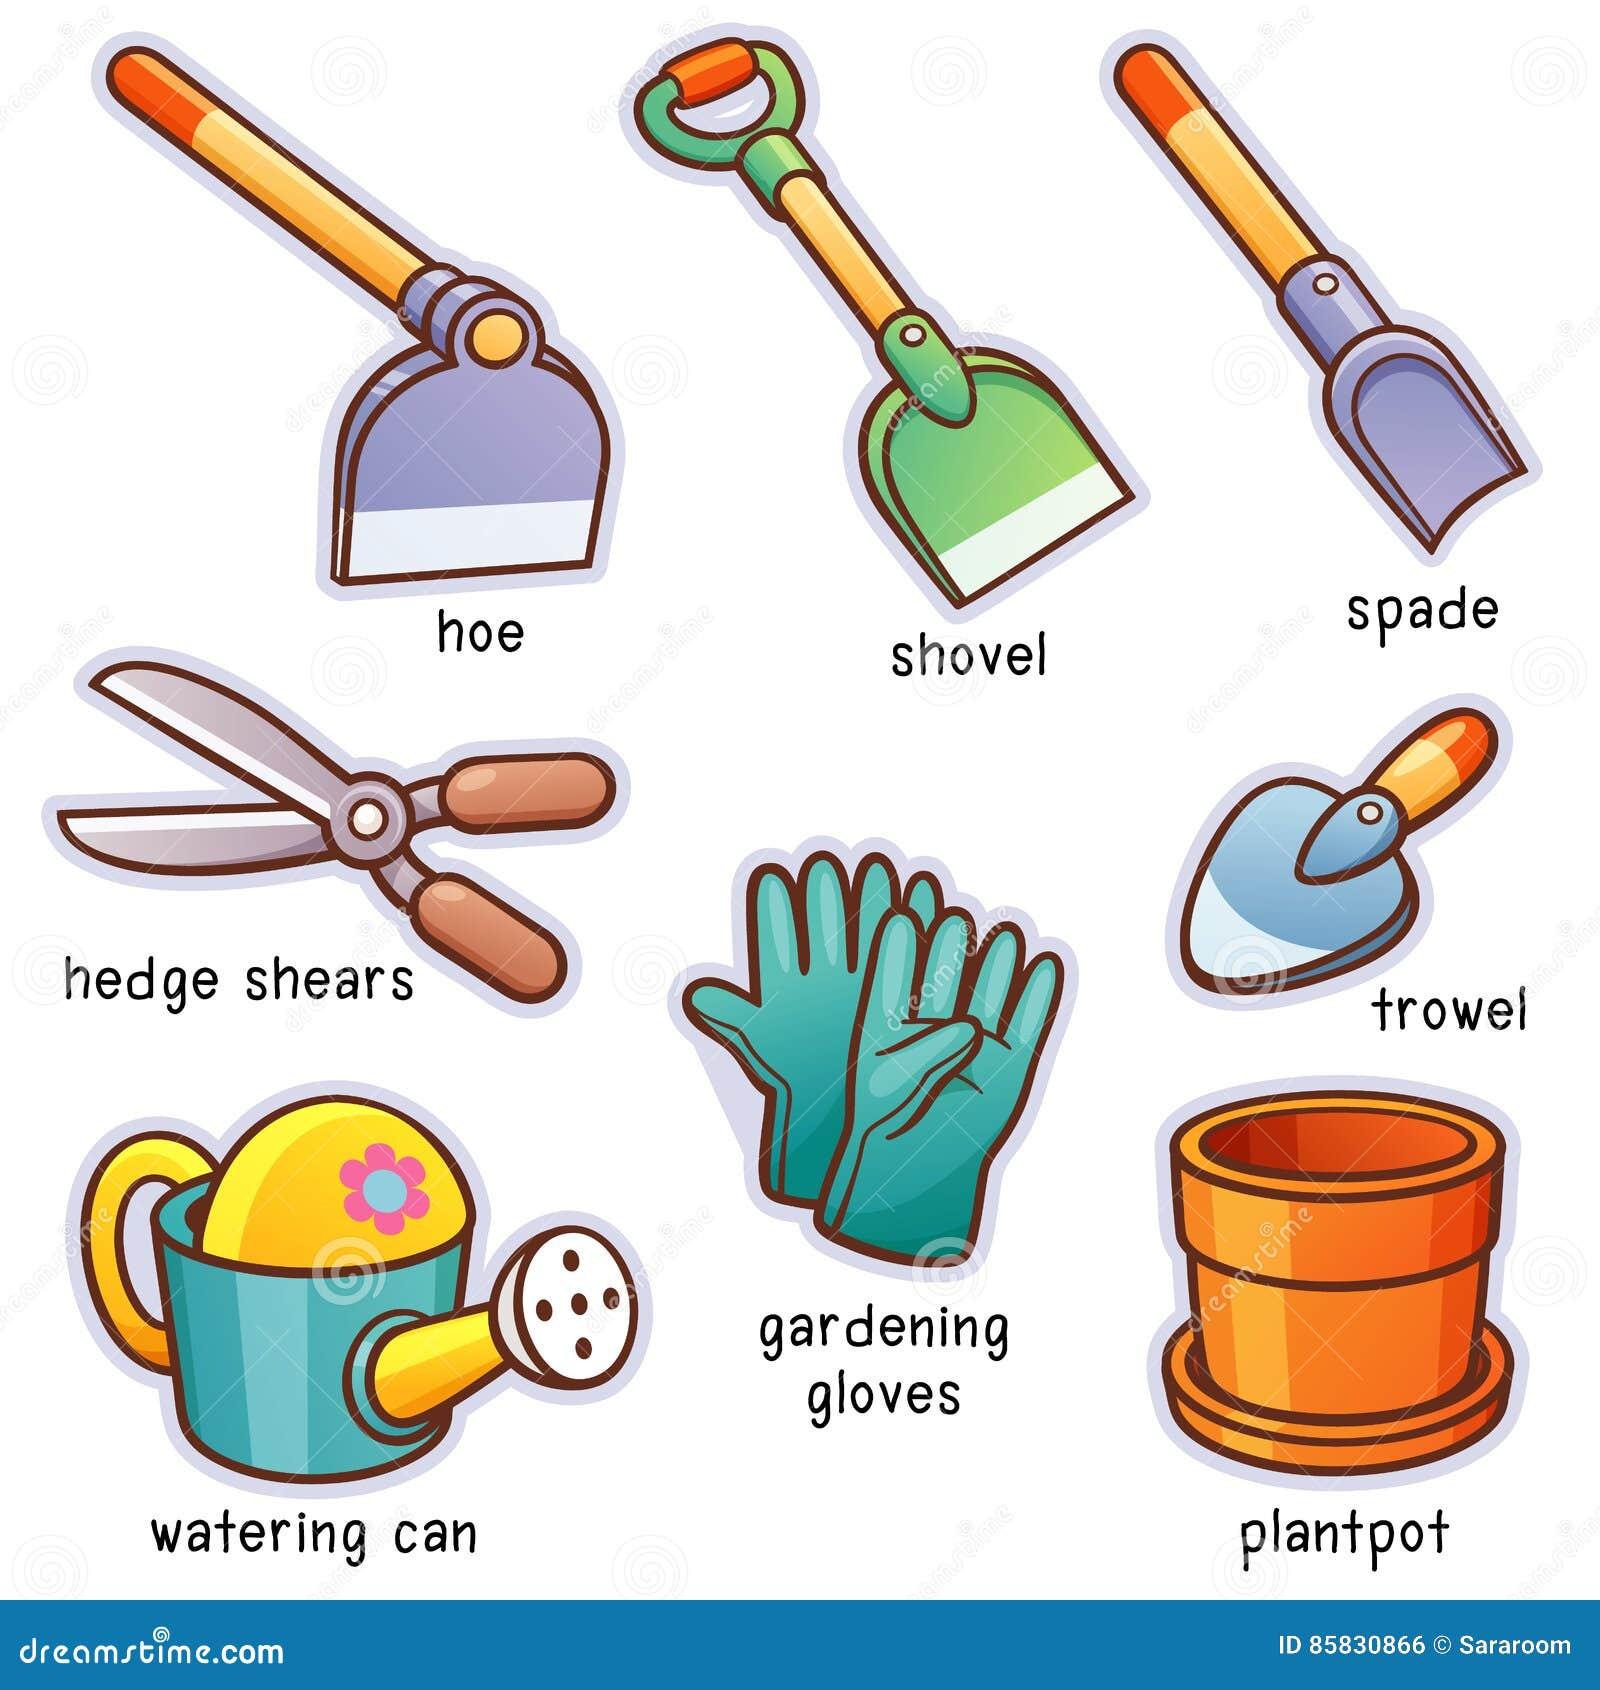 garden hoe wholesaler rajnandgaon gardening aarya for entp from tools